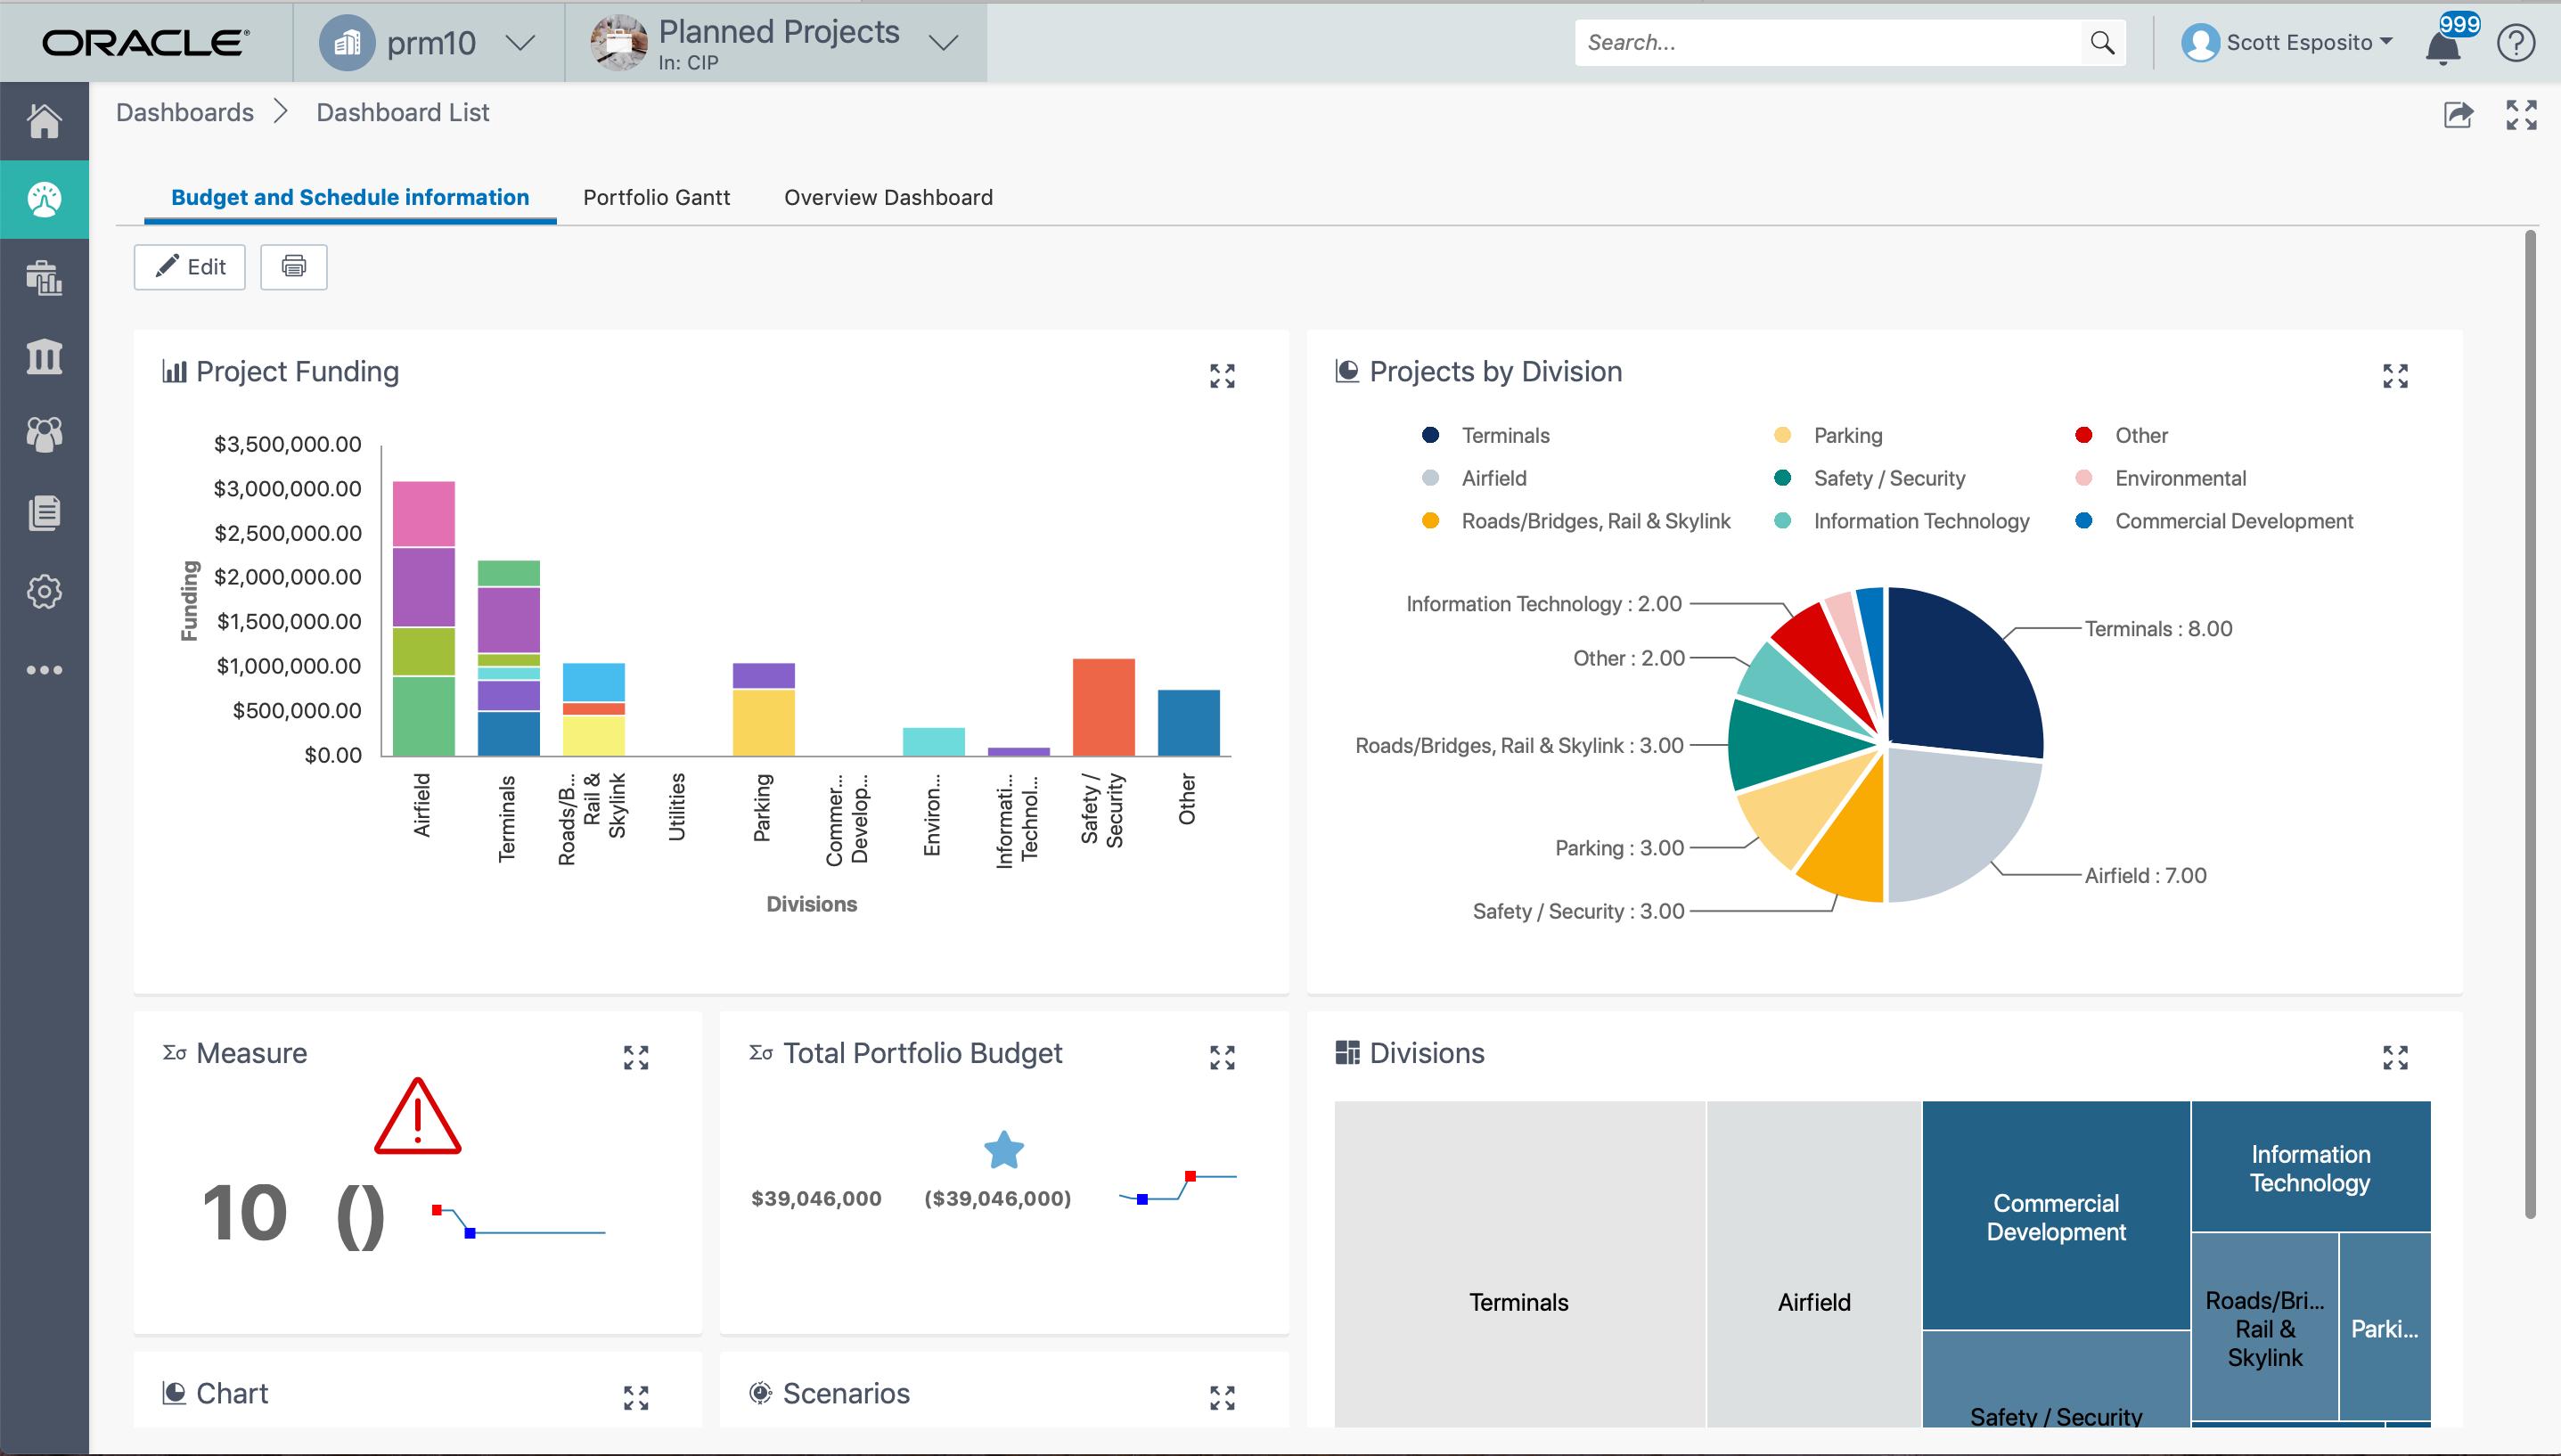 Oracle Primavera - Optimize Portfolio Performance